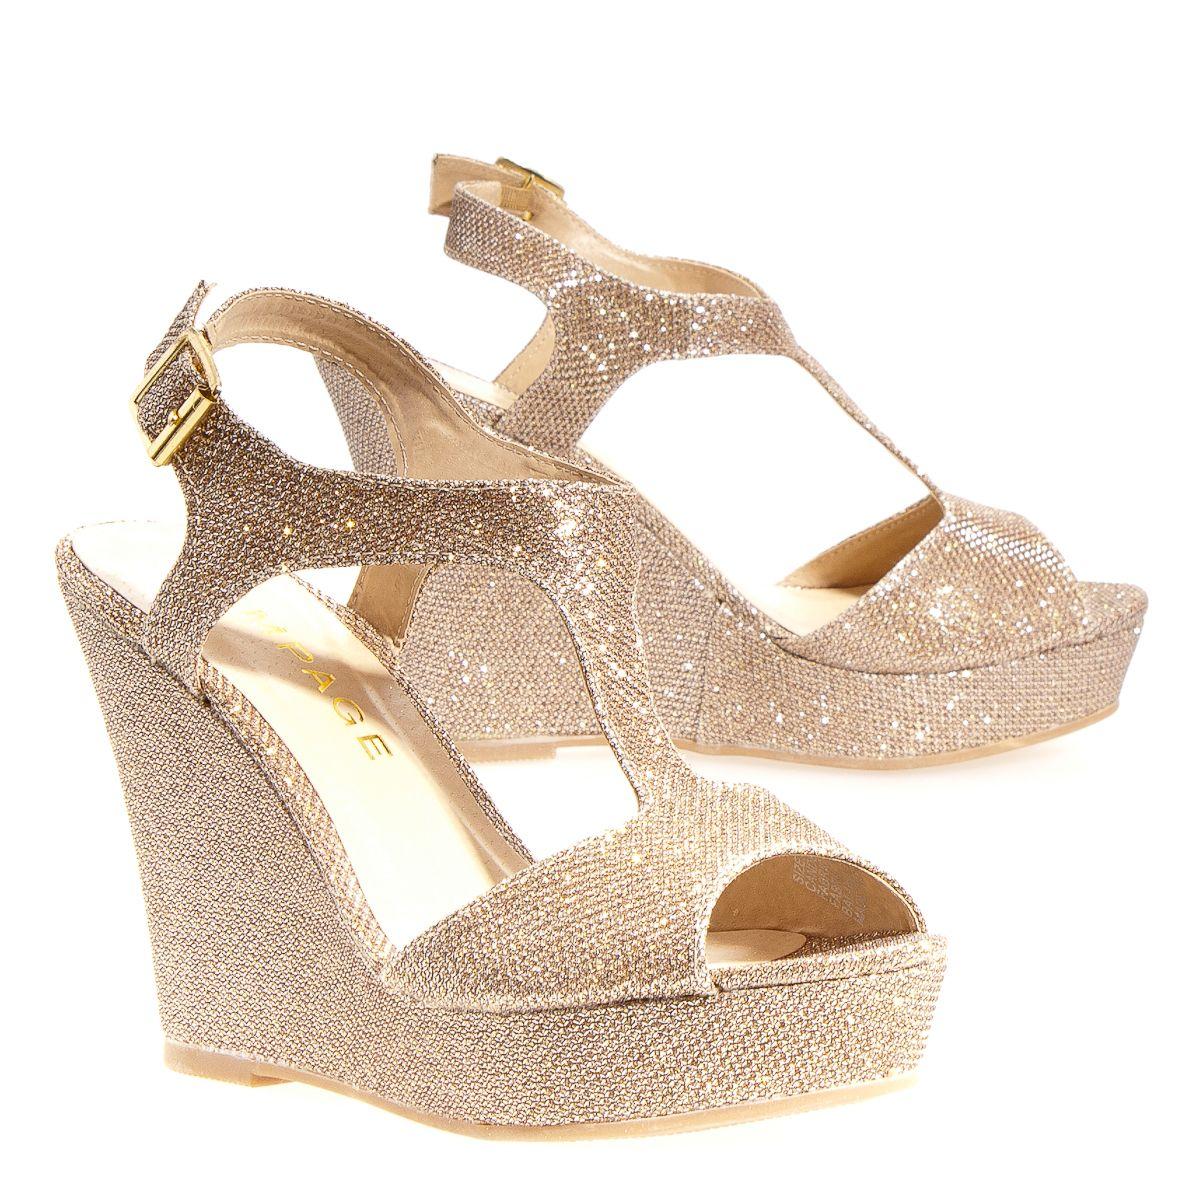 Rampage Candelas Women's Heel/Wedges: Blush 9